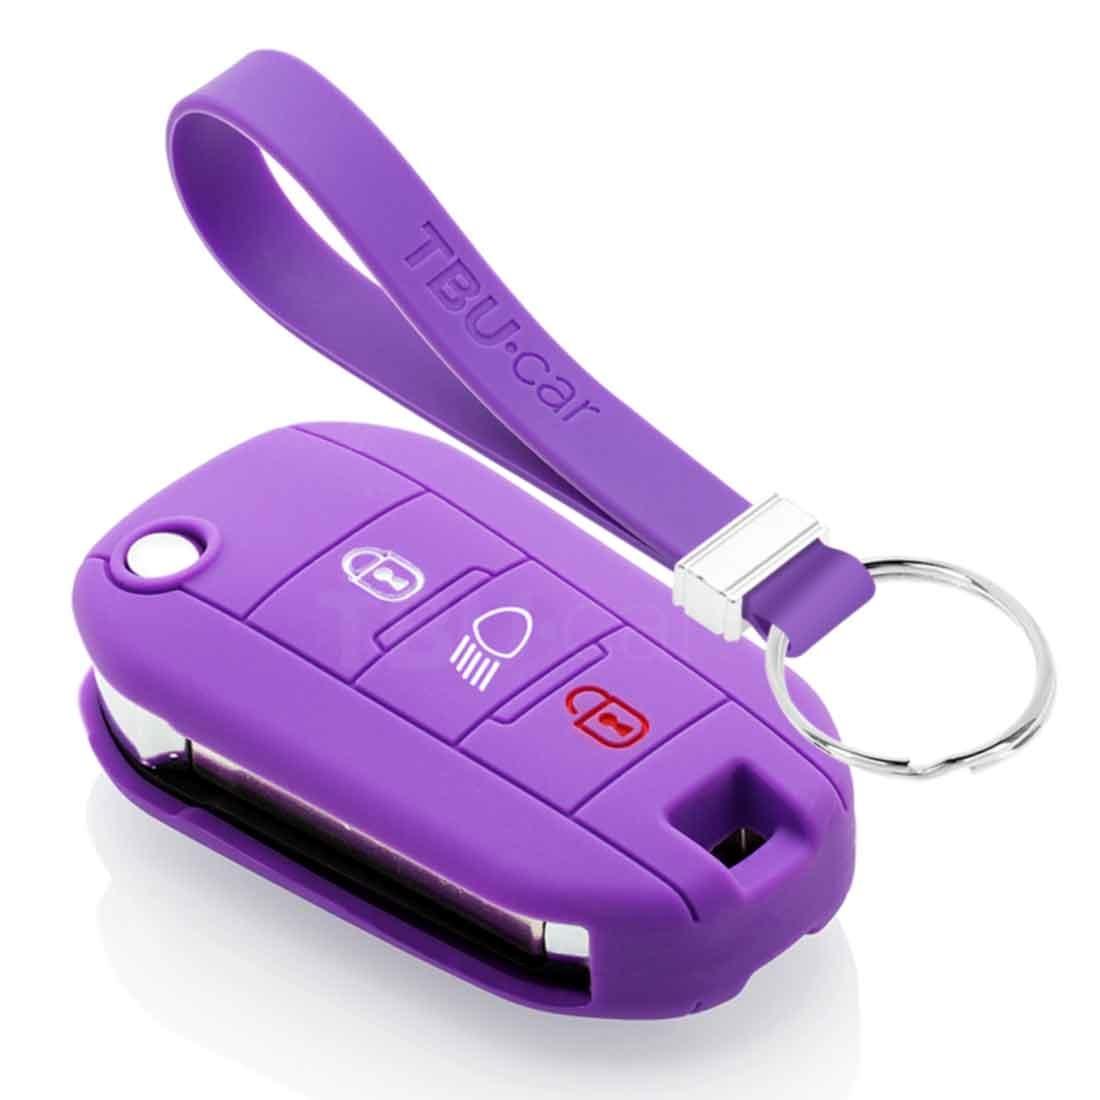 TBU car TBU car Autoschlüssel Hülle kompatibel mit Peugeot 3 Tasten (Licht Taste) - Schutzhülle aus Silikon - Auto Schlüsselhülle Cover in Violett